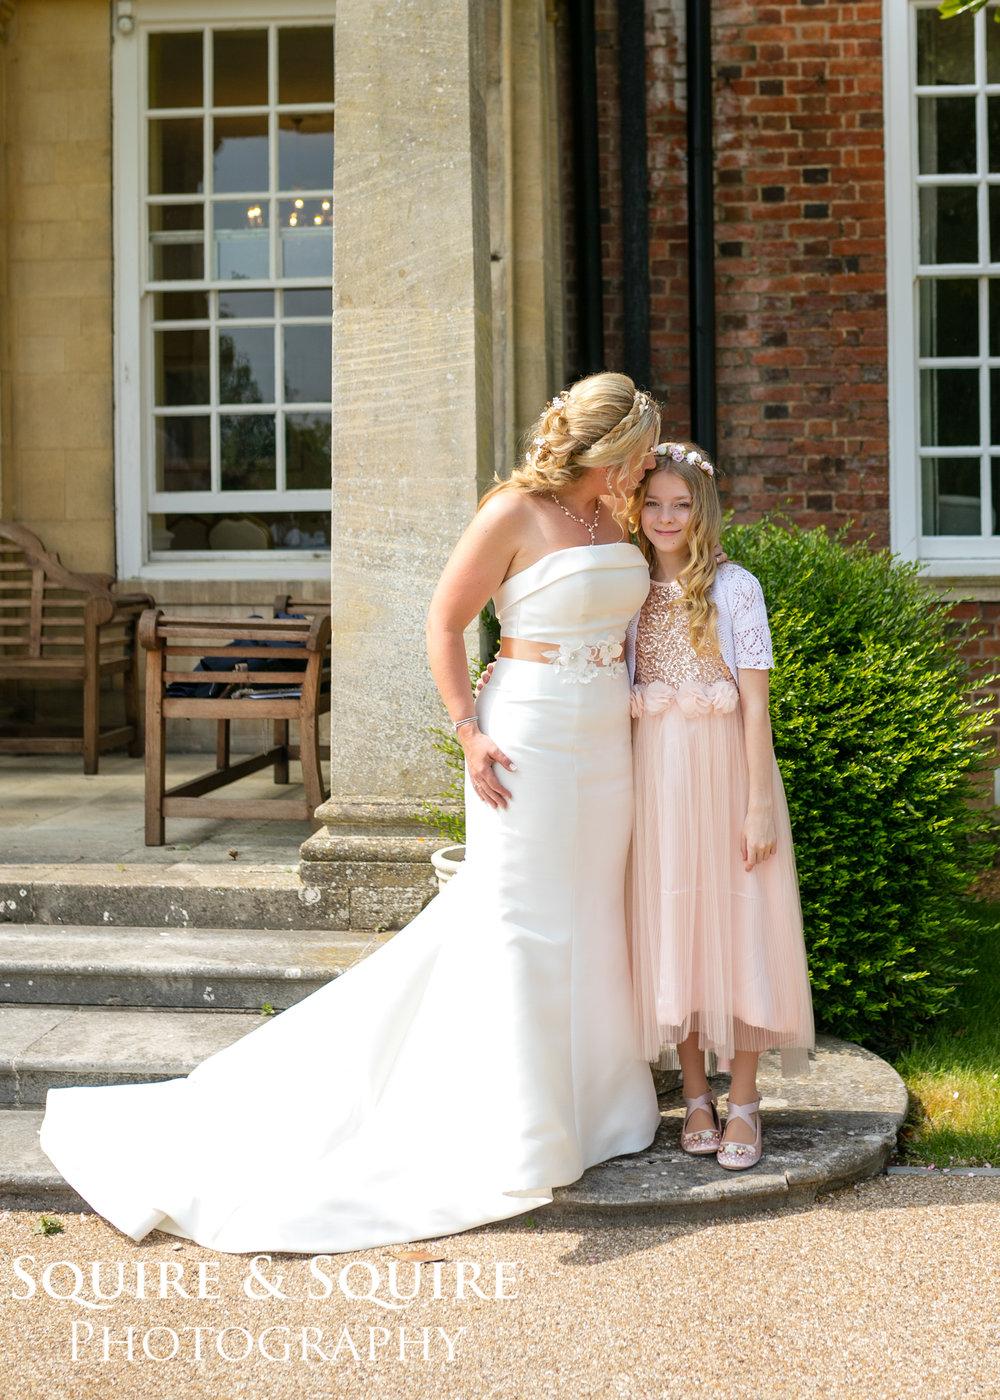 wedding_photography_catthorpe Manor (56 of 66).jpg